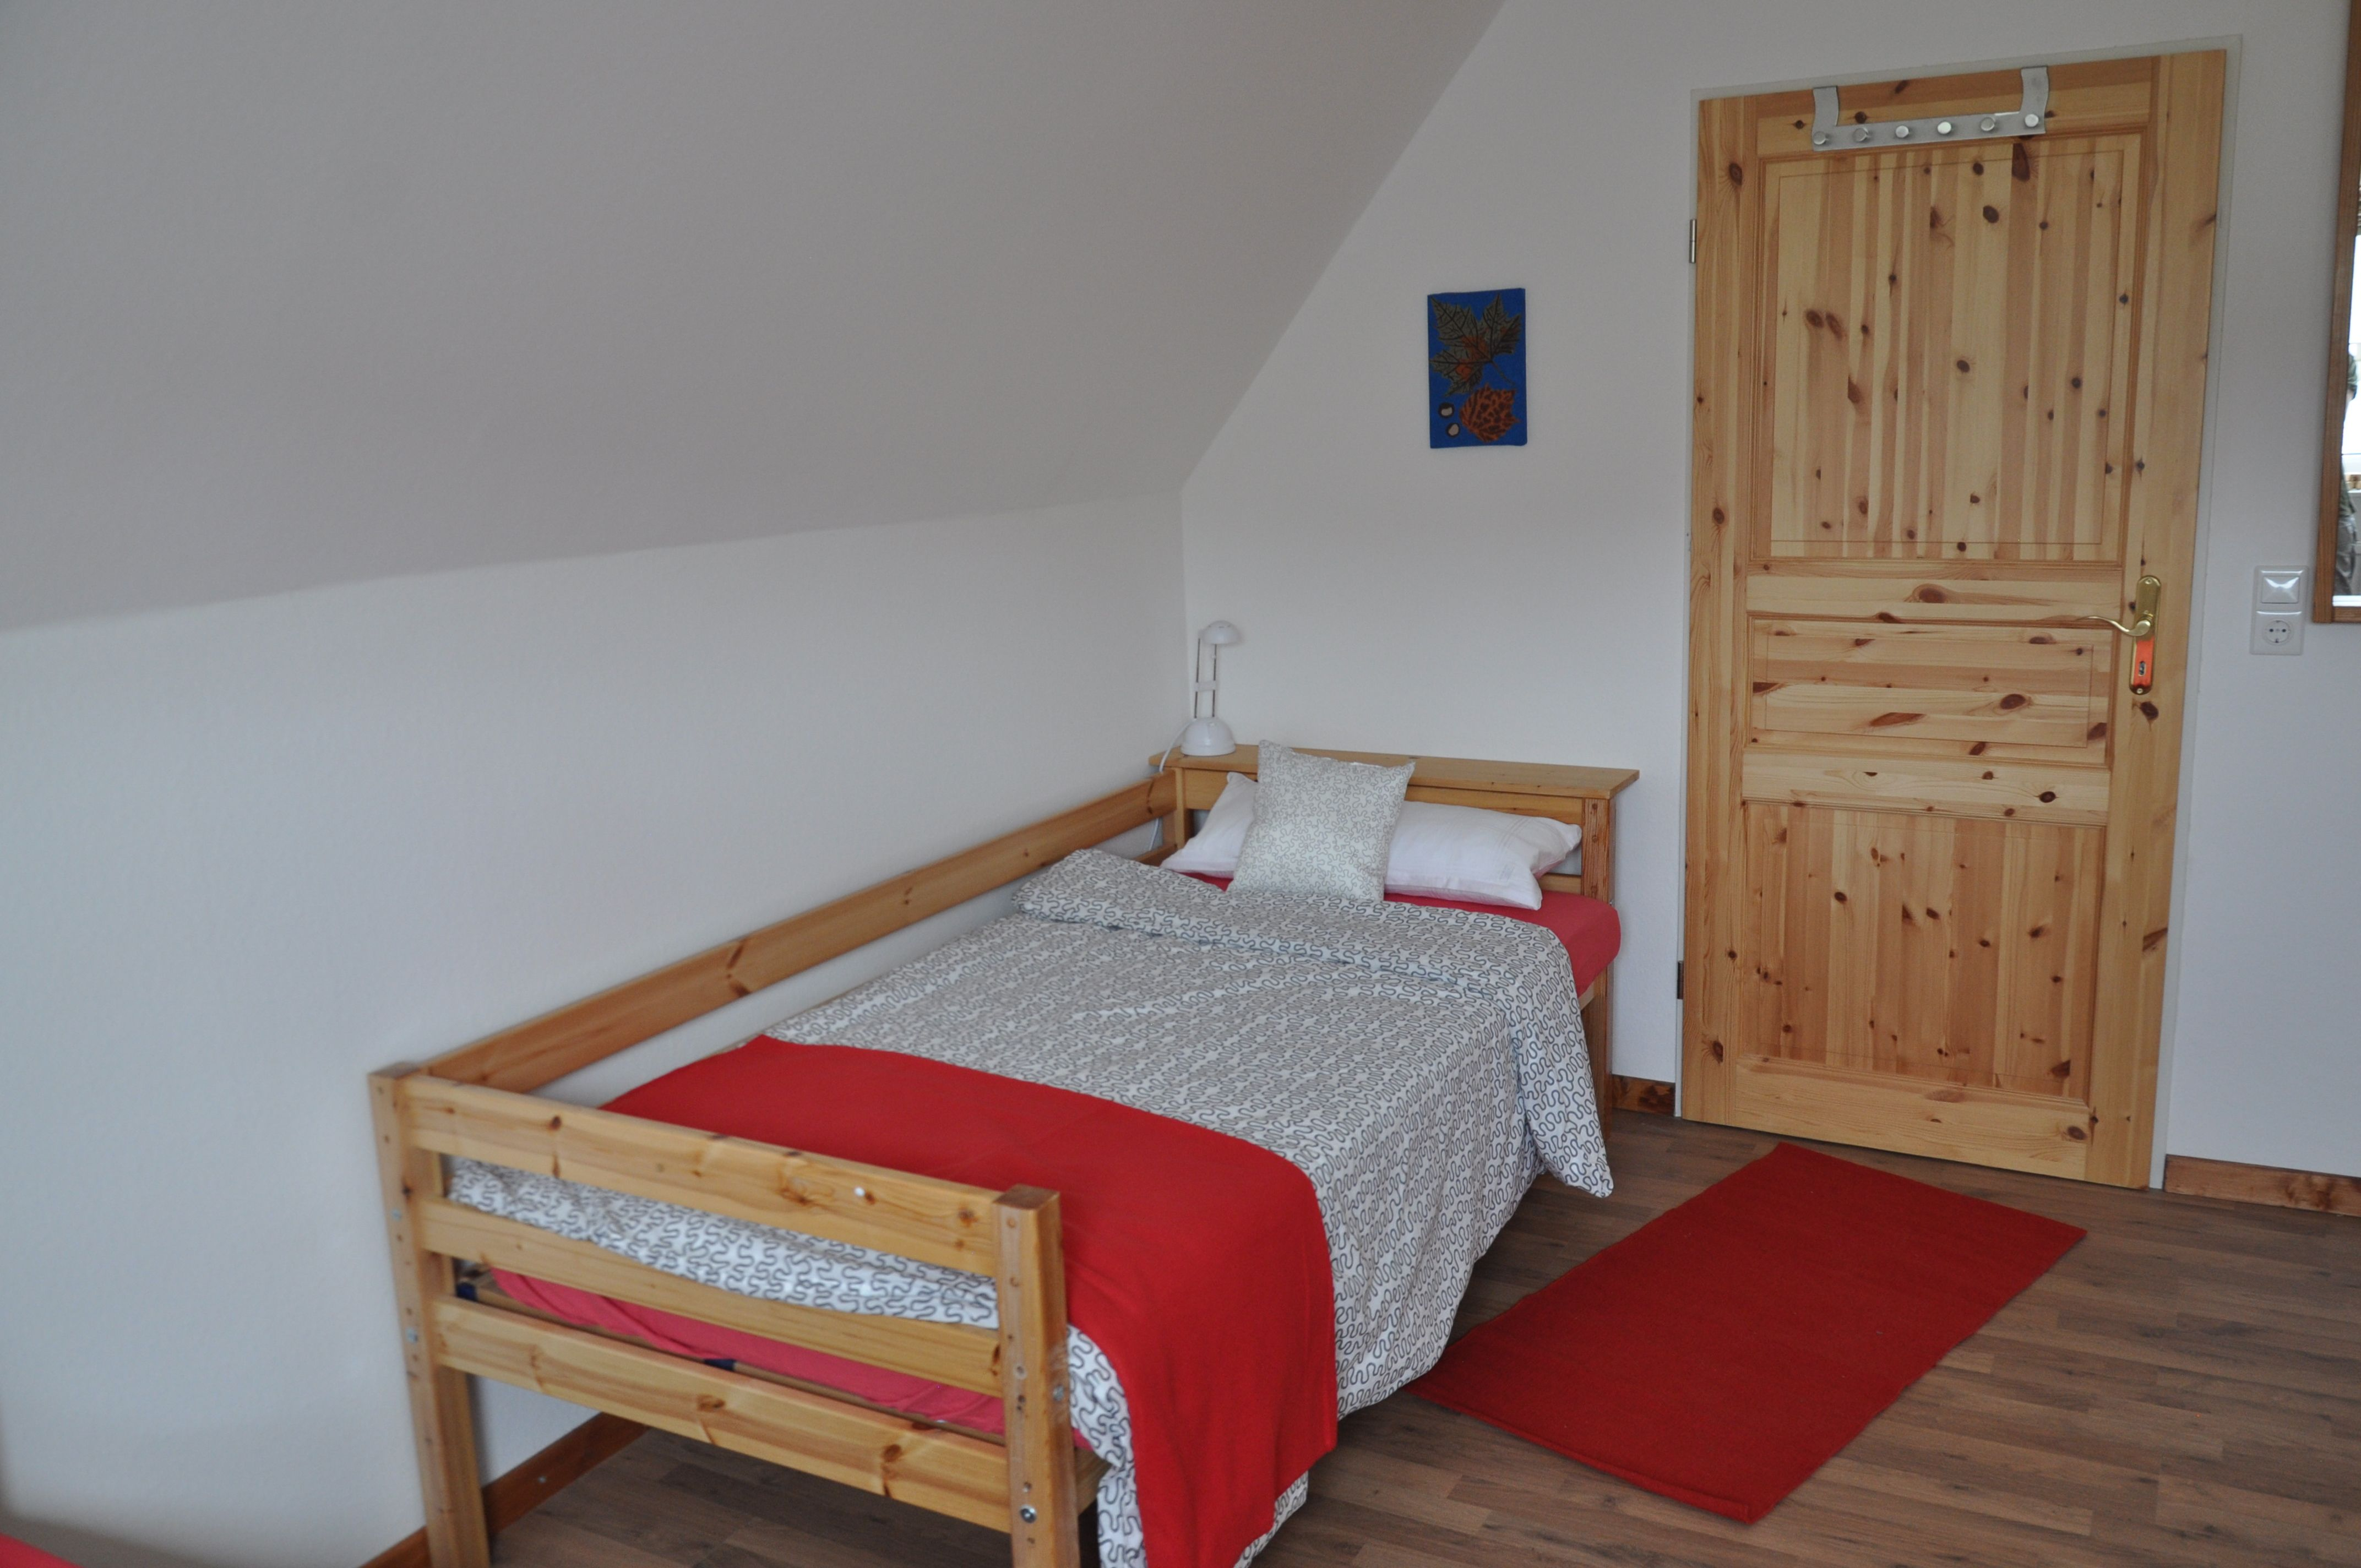 Zimmer 3 Ferienhaus Rosenwinkel am Silberbach